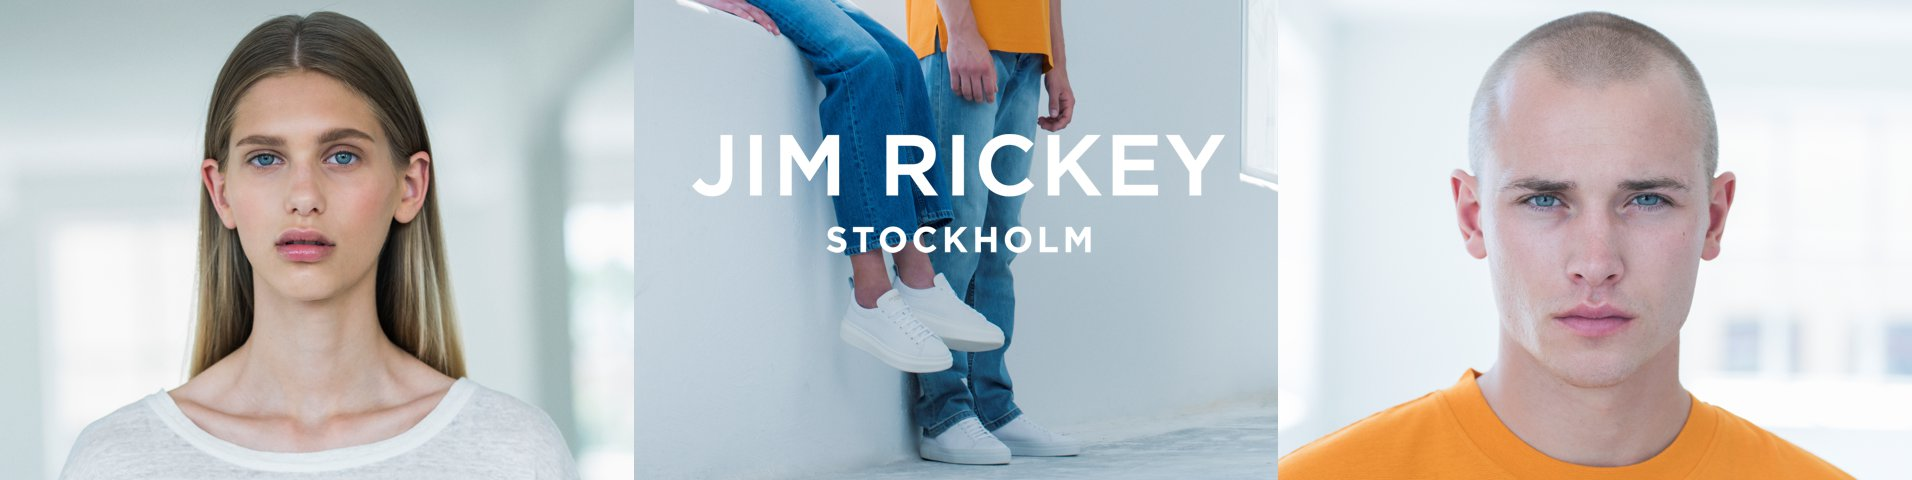 Jim Rickey en ligne | Nouvelle collection sur Zalando